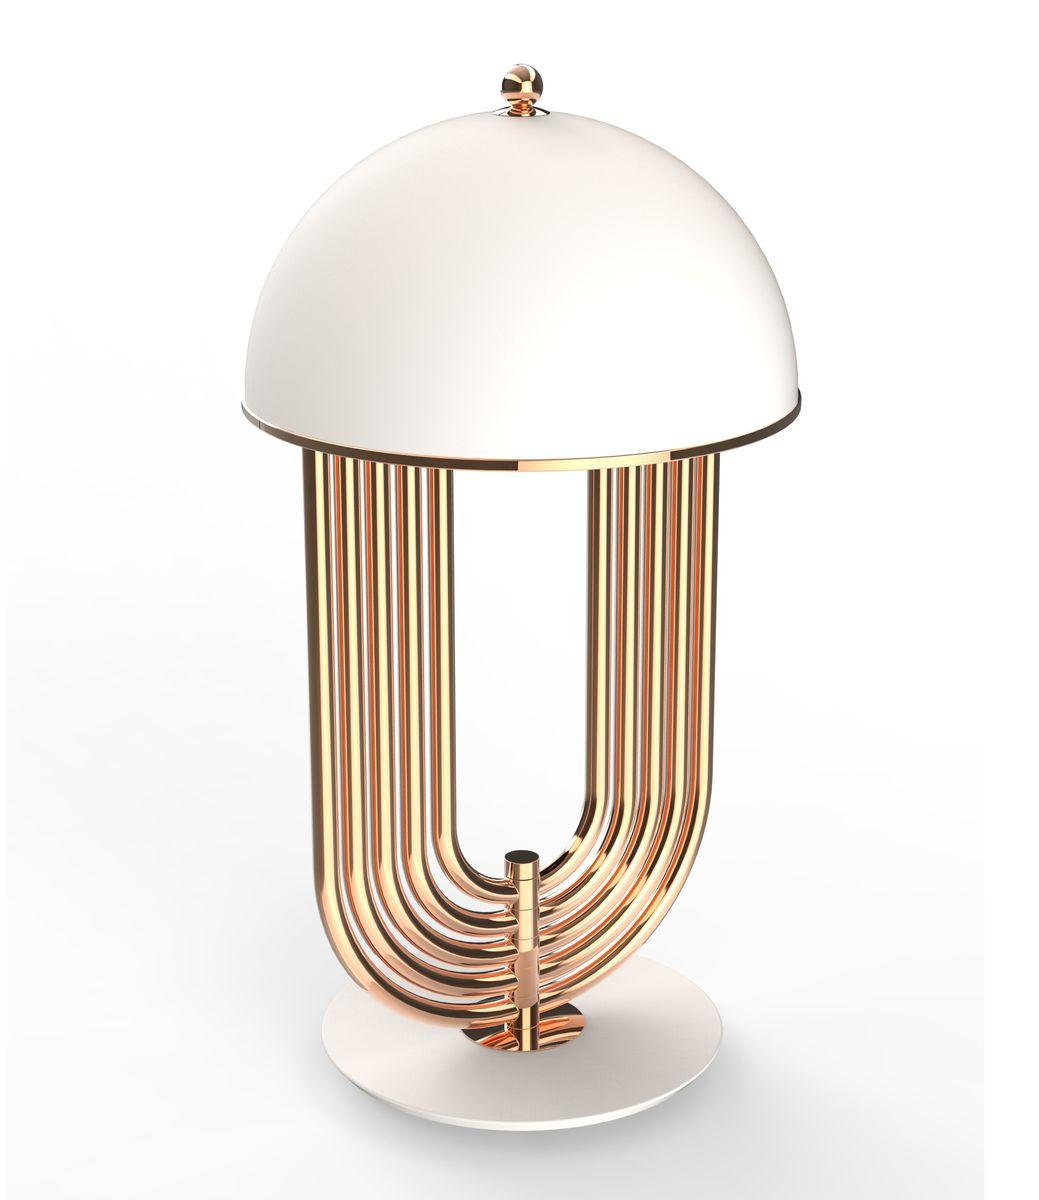 obiecte de design celebre Turner Lamp